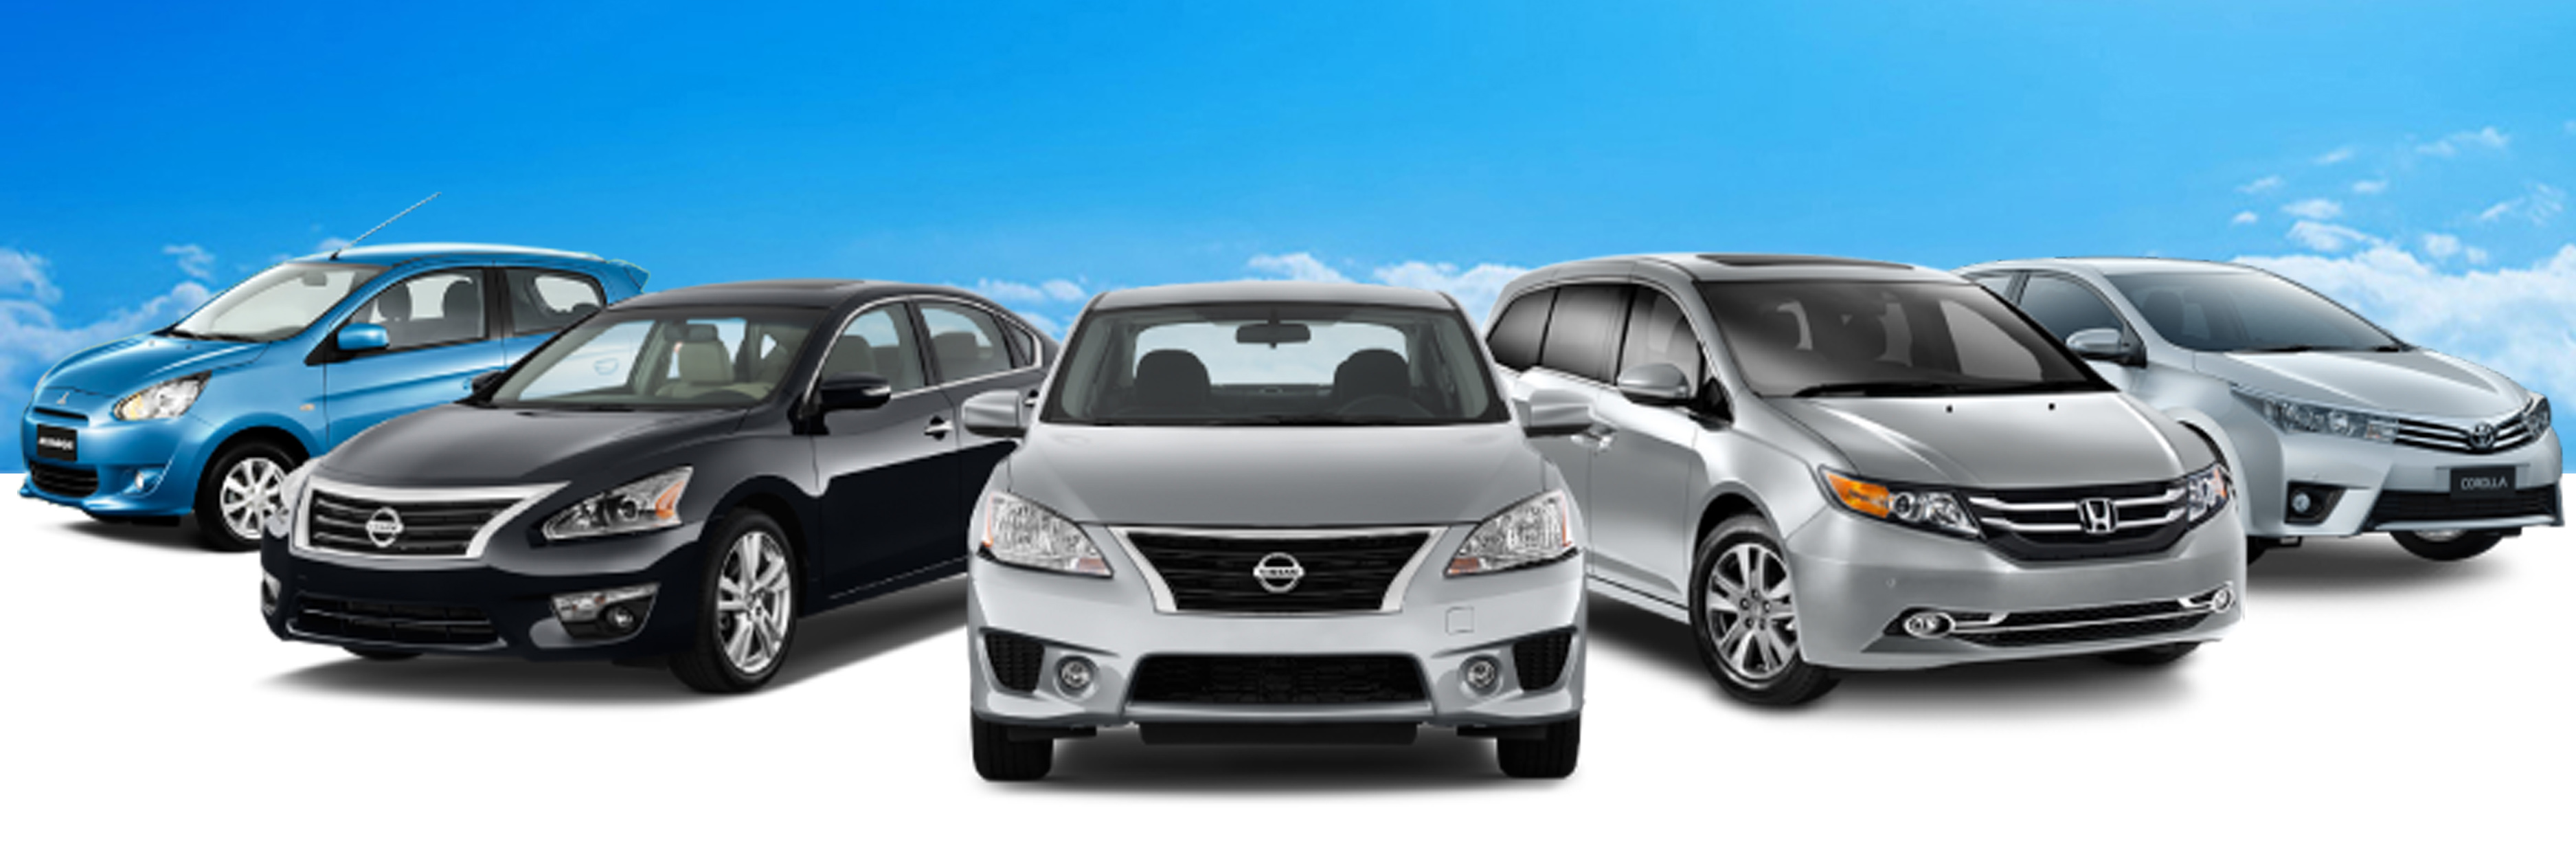 effective car renatal service